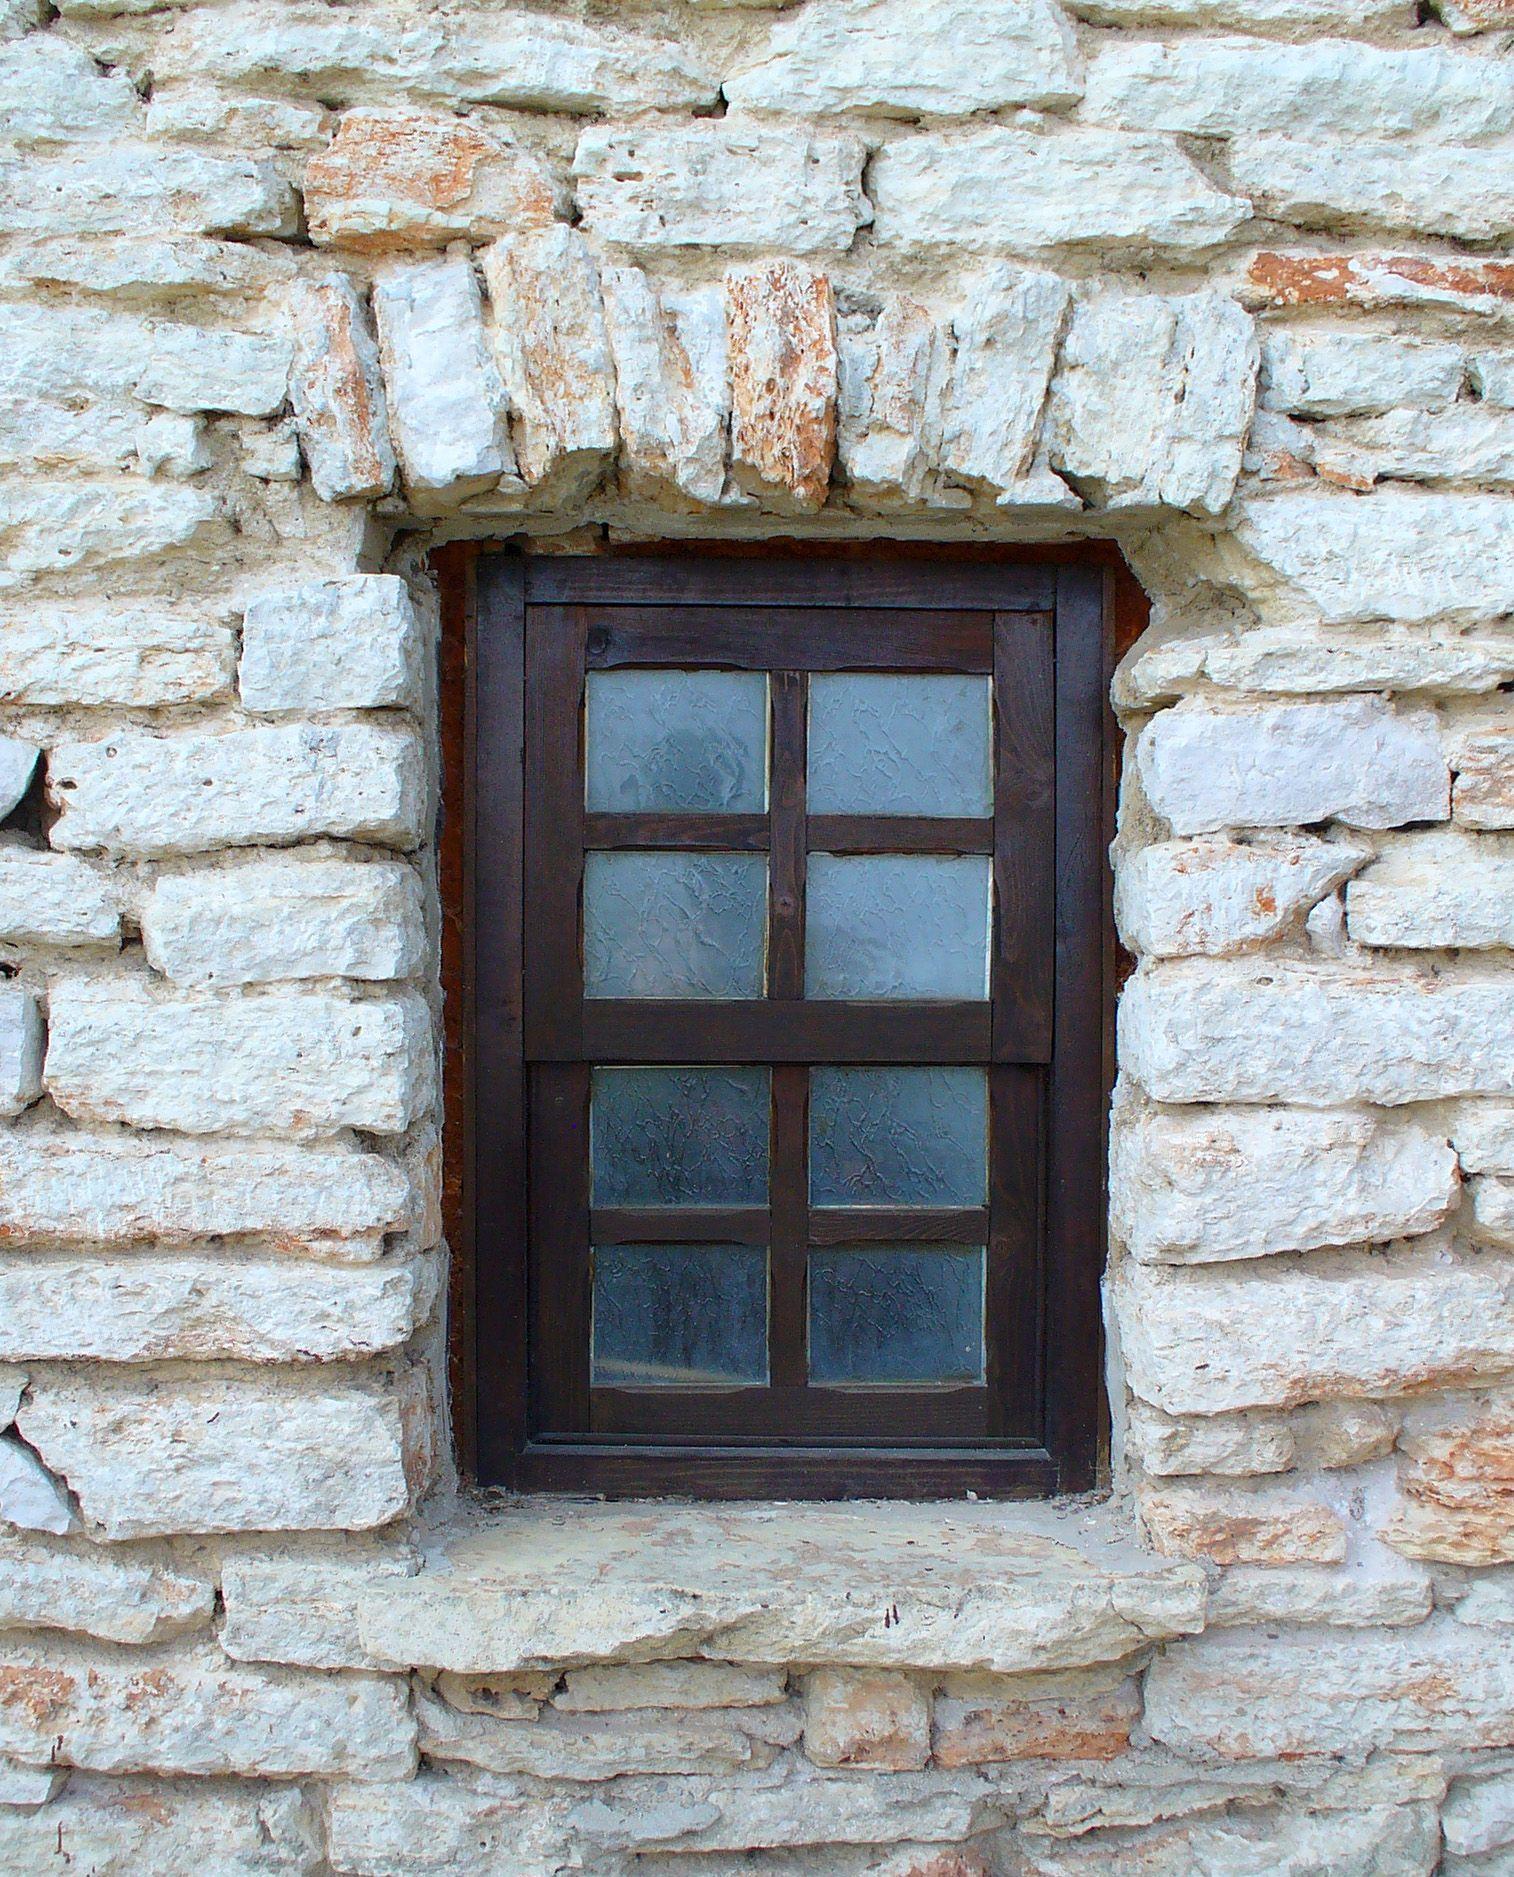 Antique Windows Antique Window Images Vintage Window In Stone Brick Wall Texture